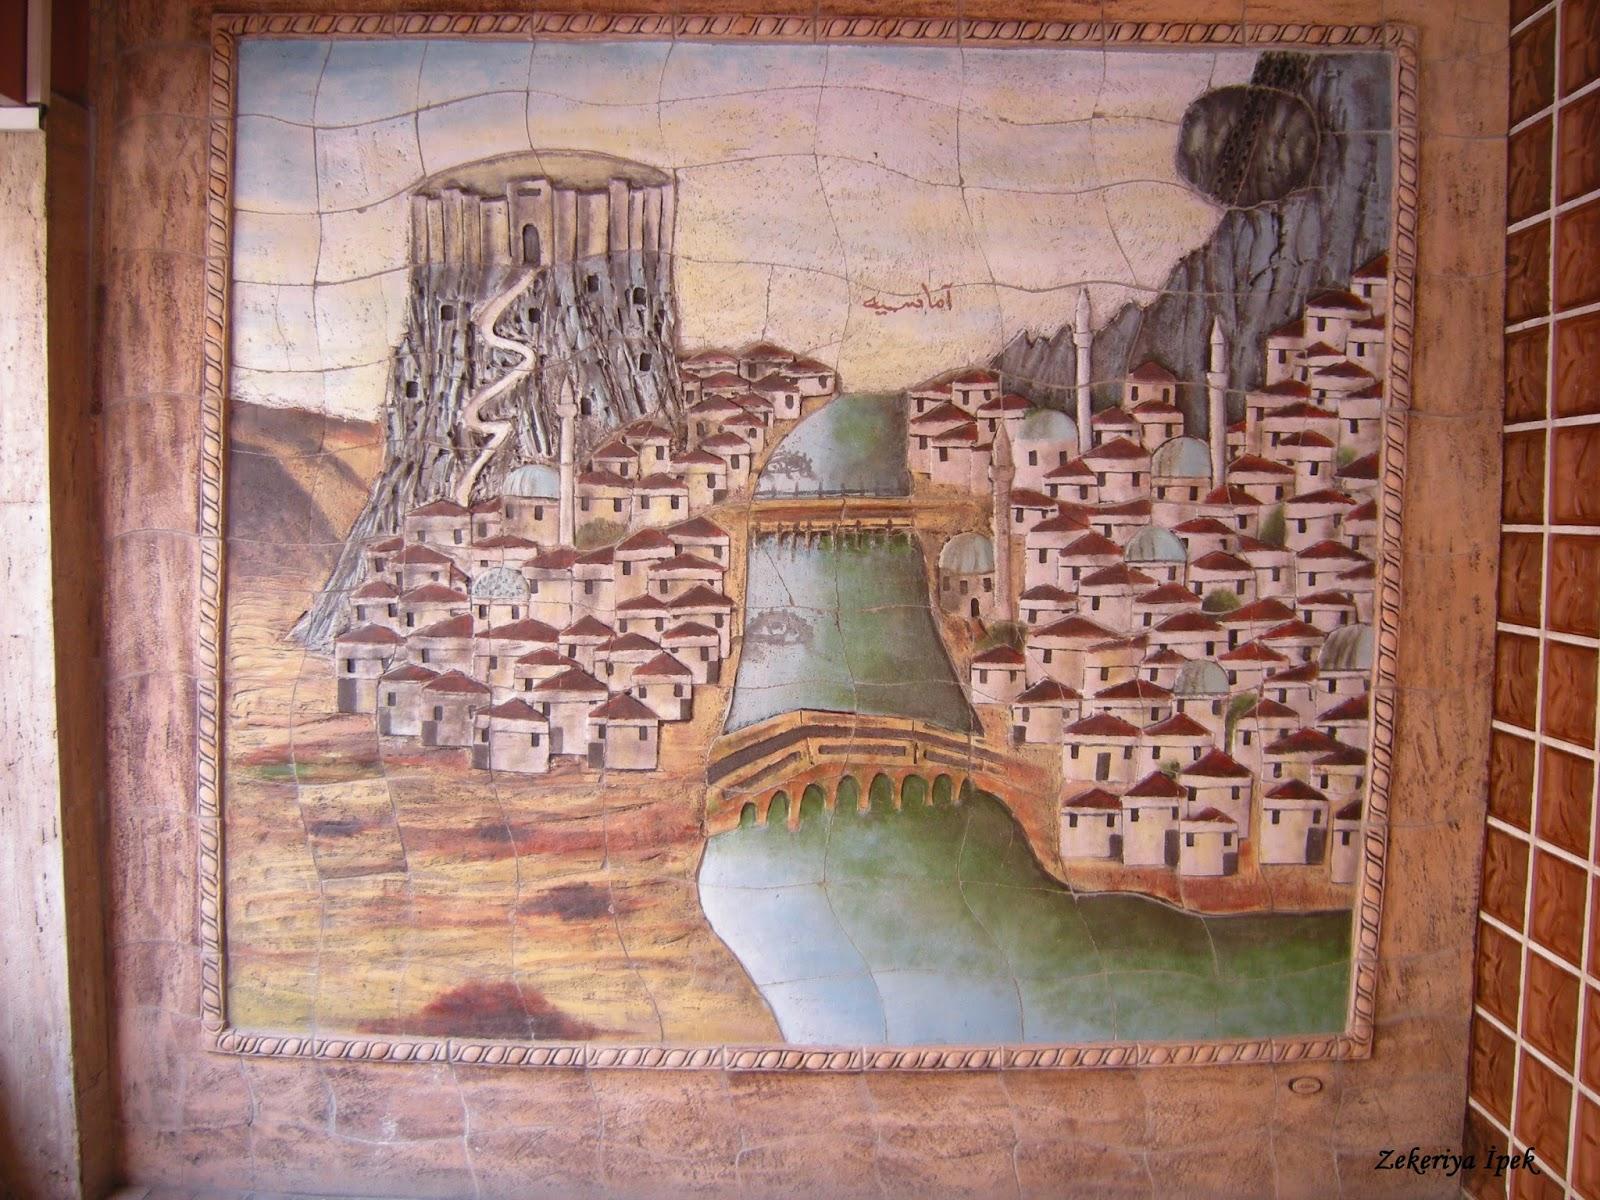 AMASYA MÜZESİ-MUMYALAR SALONU / AMASYA MUSEUM-MUMMIES HALL ...